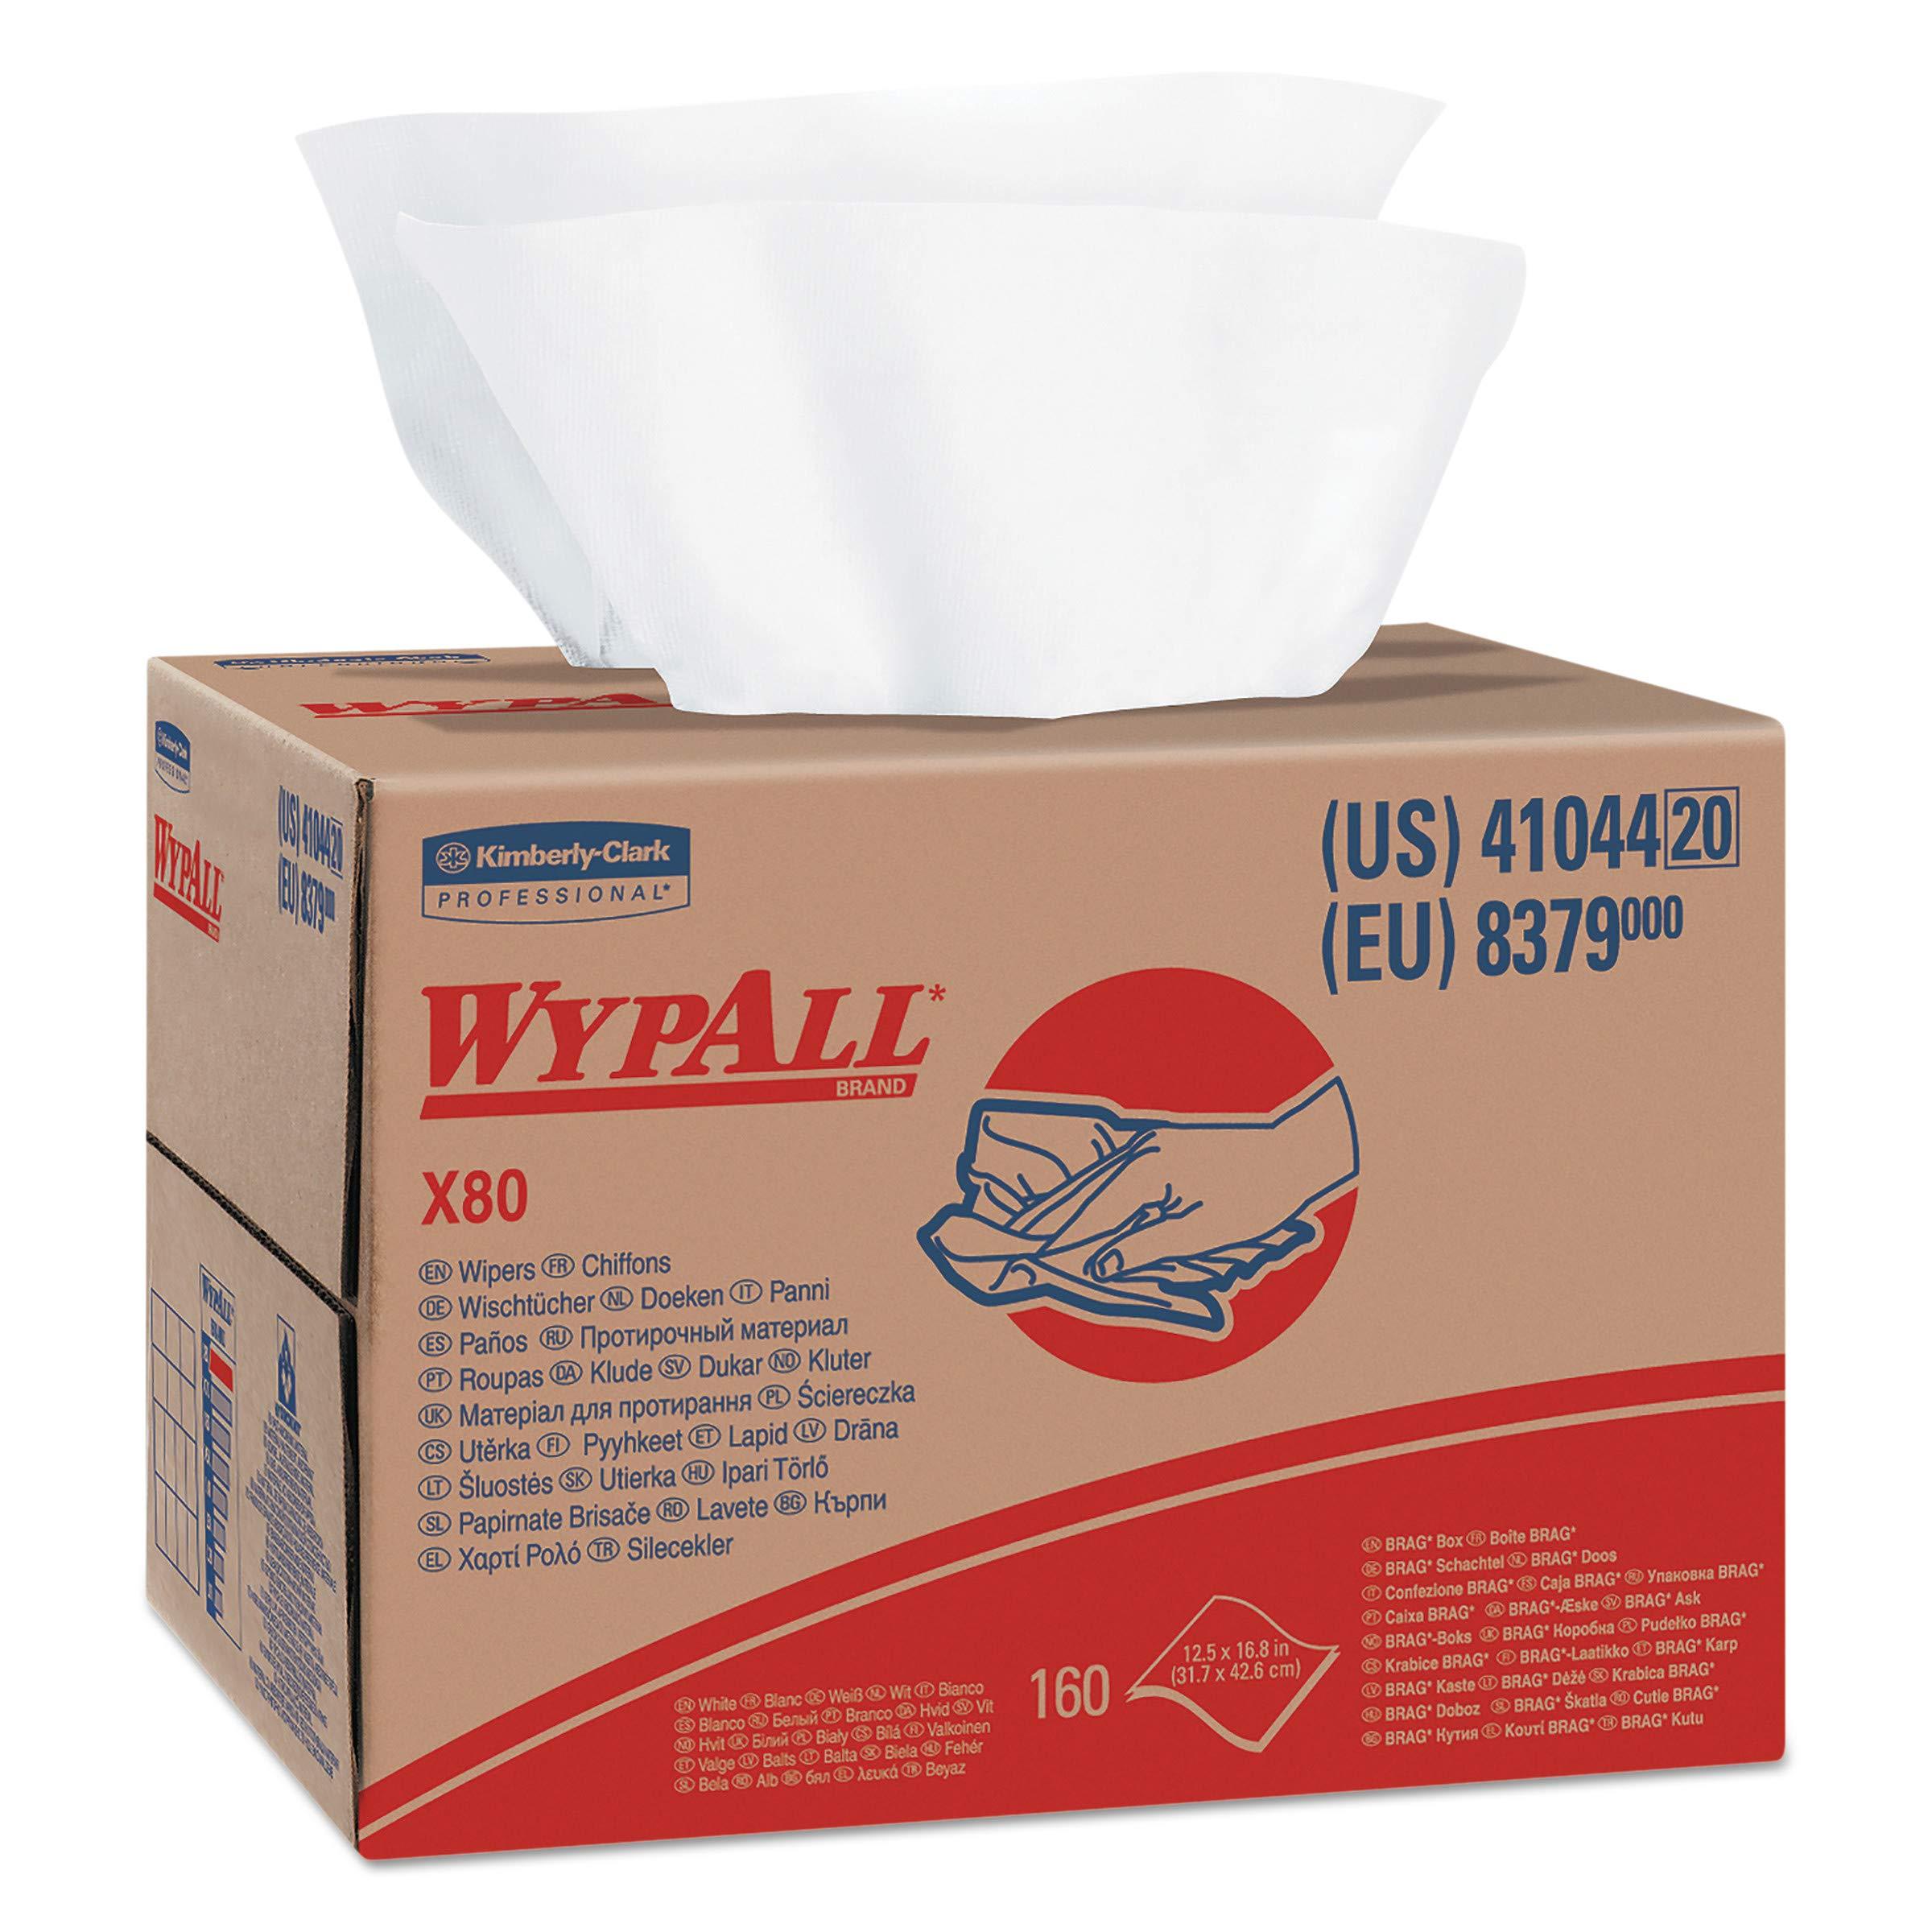 WypAll 41044 X80 Cloths, HYDROKNIT, BRAG Box, White, 12 1/2 x 16 4/5 (Box of 160) by Wypall